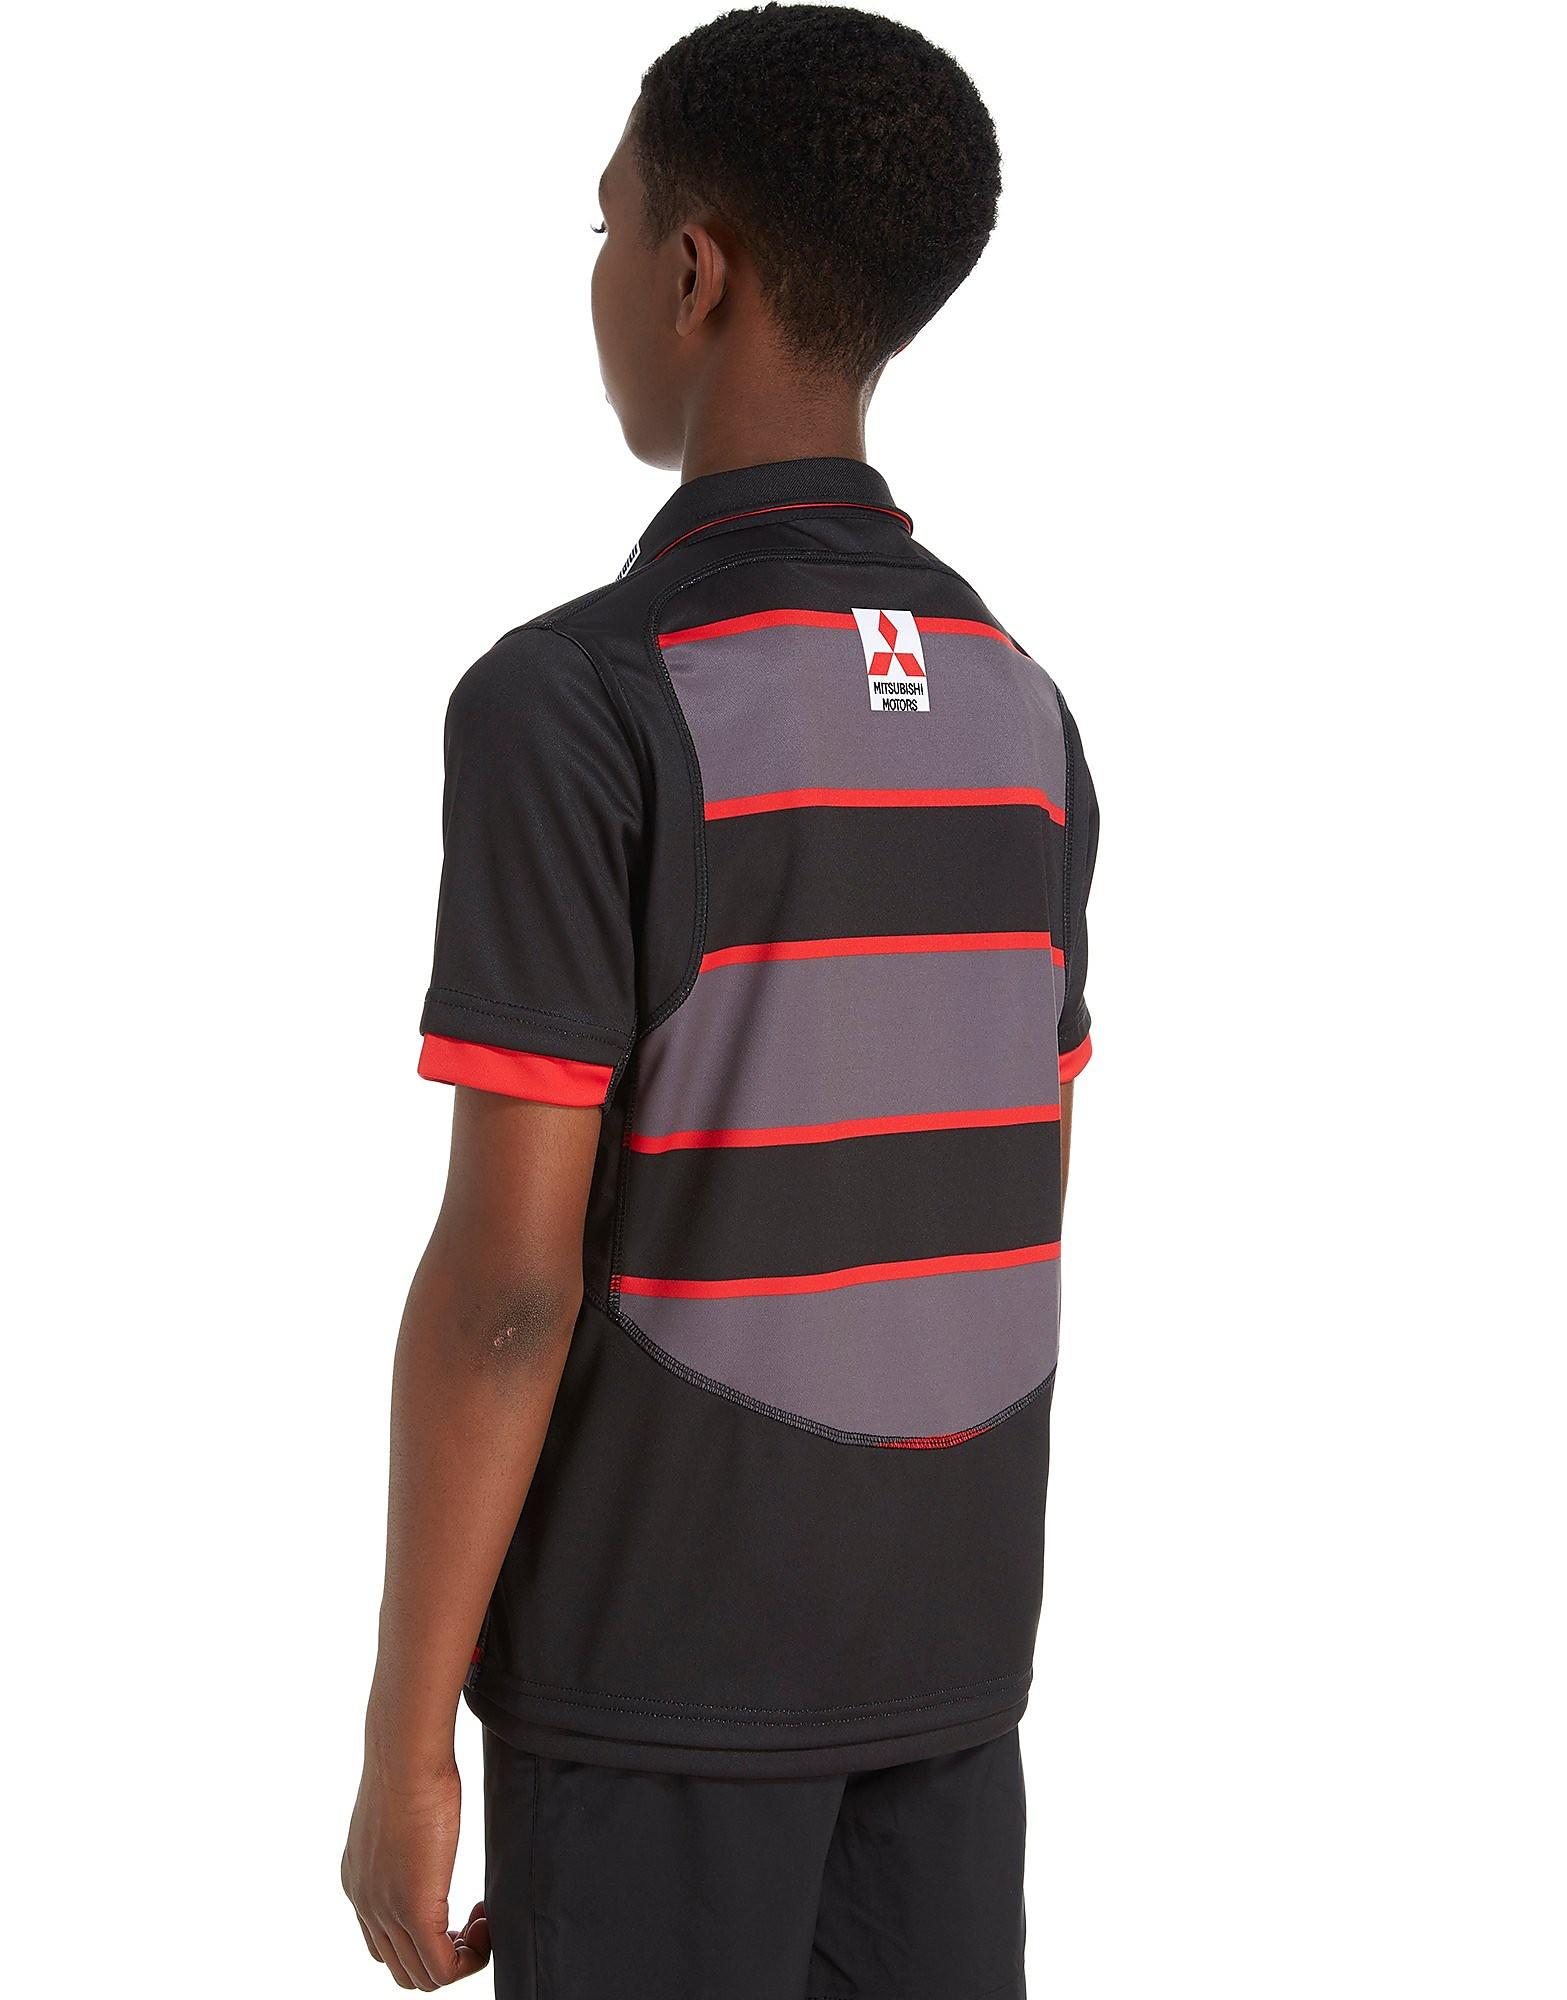 Macron Edinburgh Rugby 2017/18 Home Shirt Junior